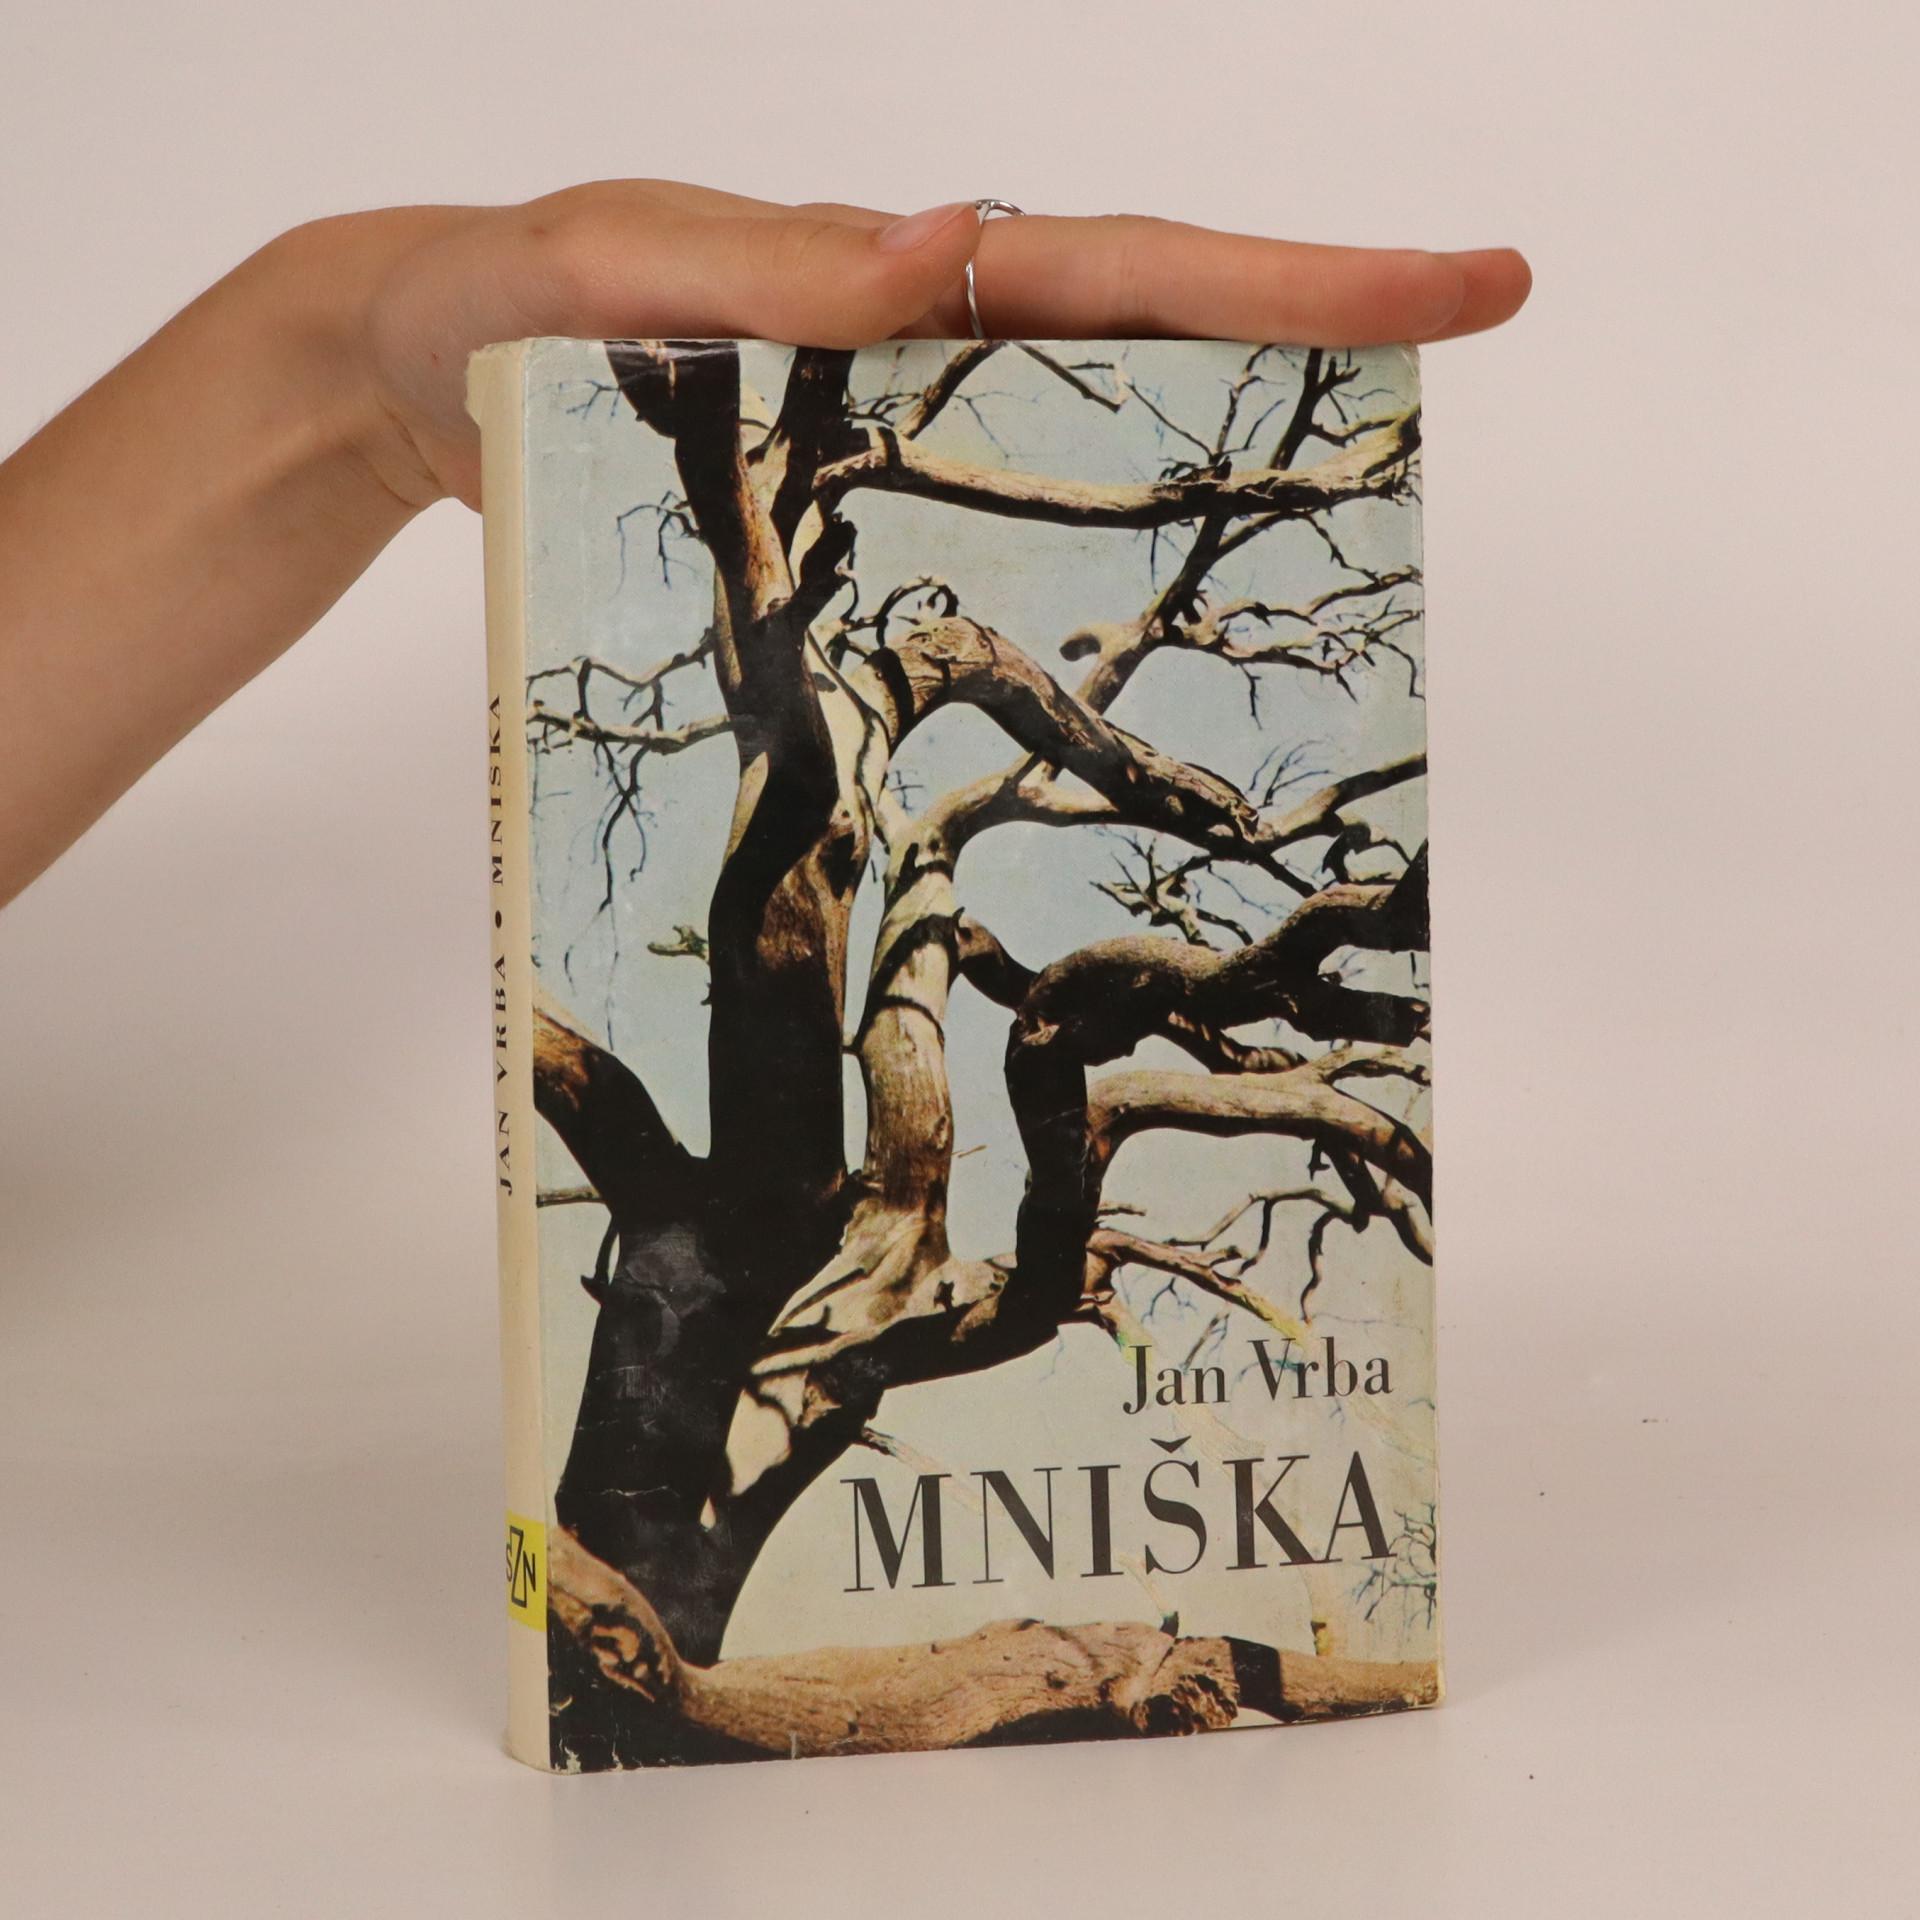 antikvární kniha Mniška, 1970